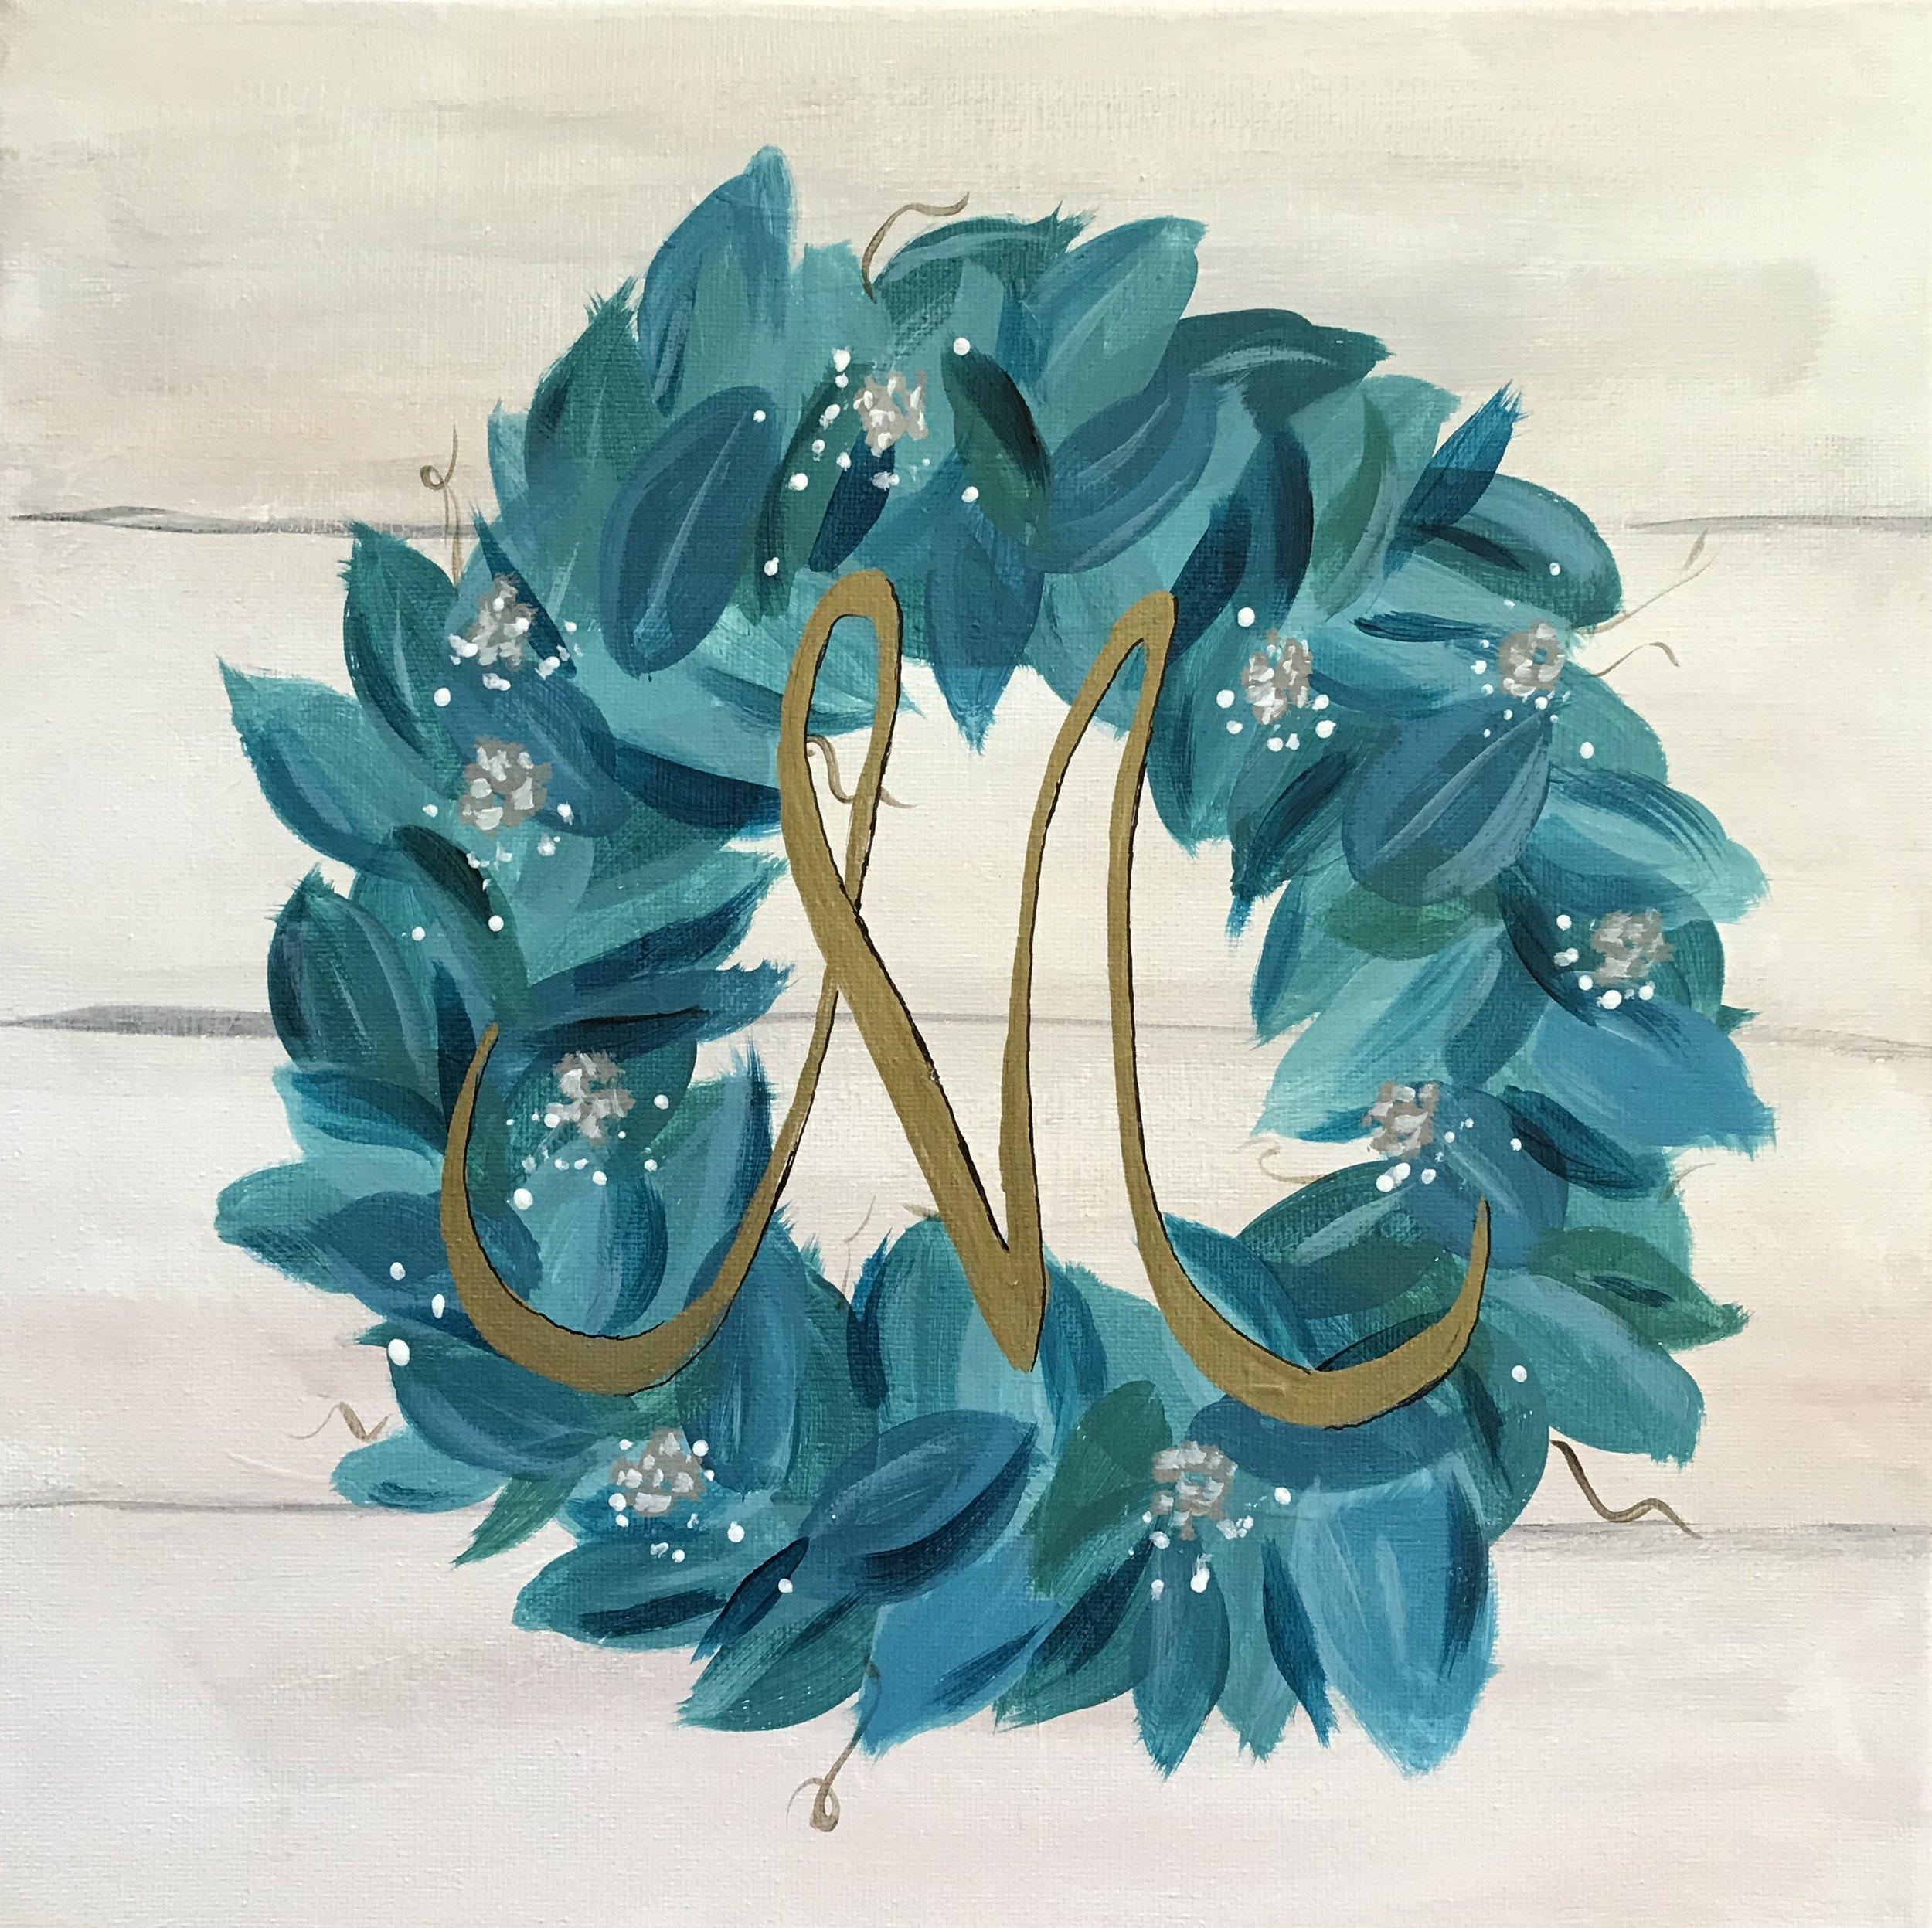 Monogramed Wreath.jpg